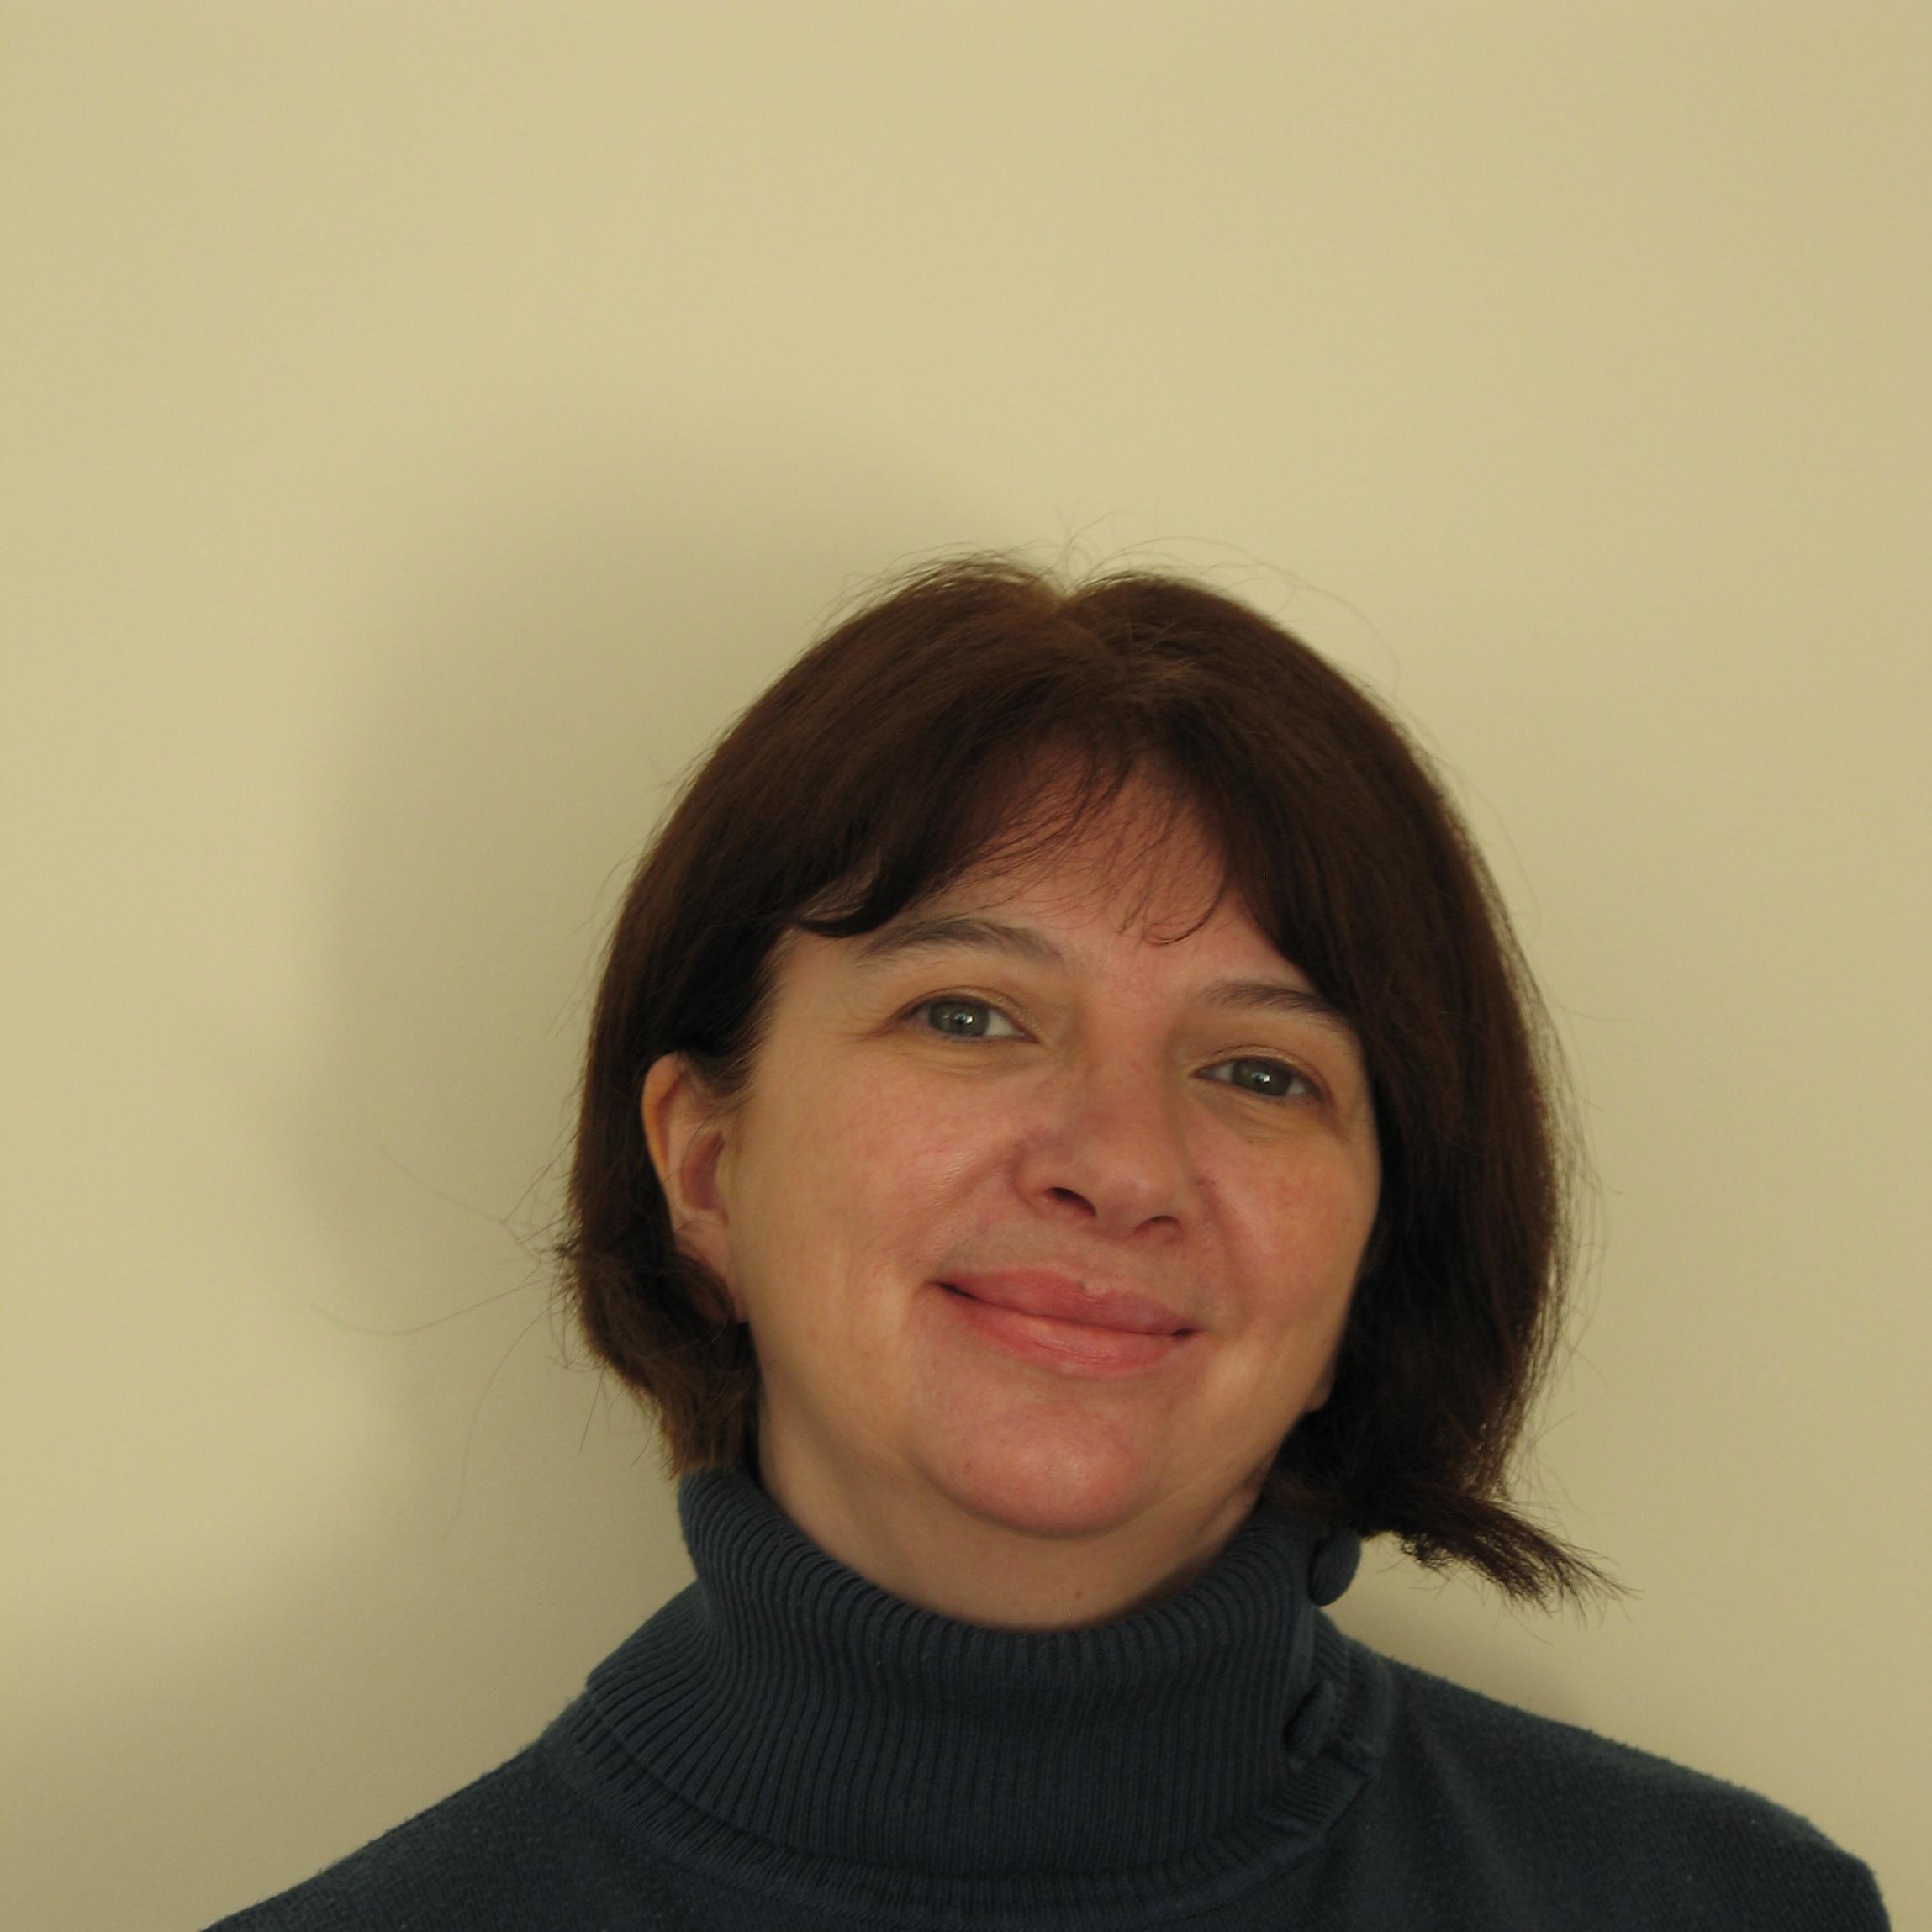 Mairi McLeod